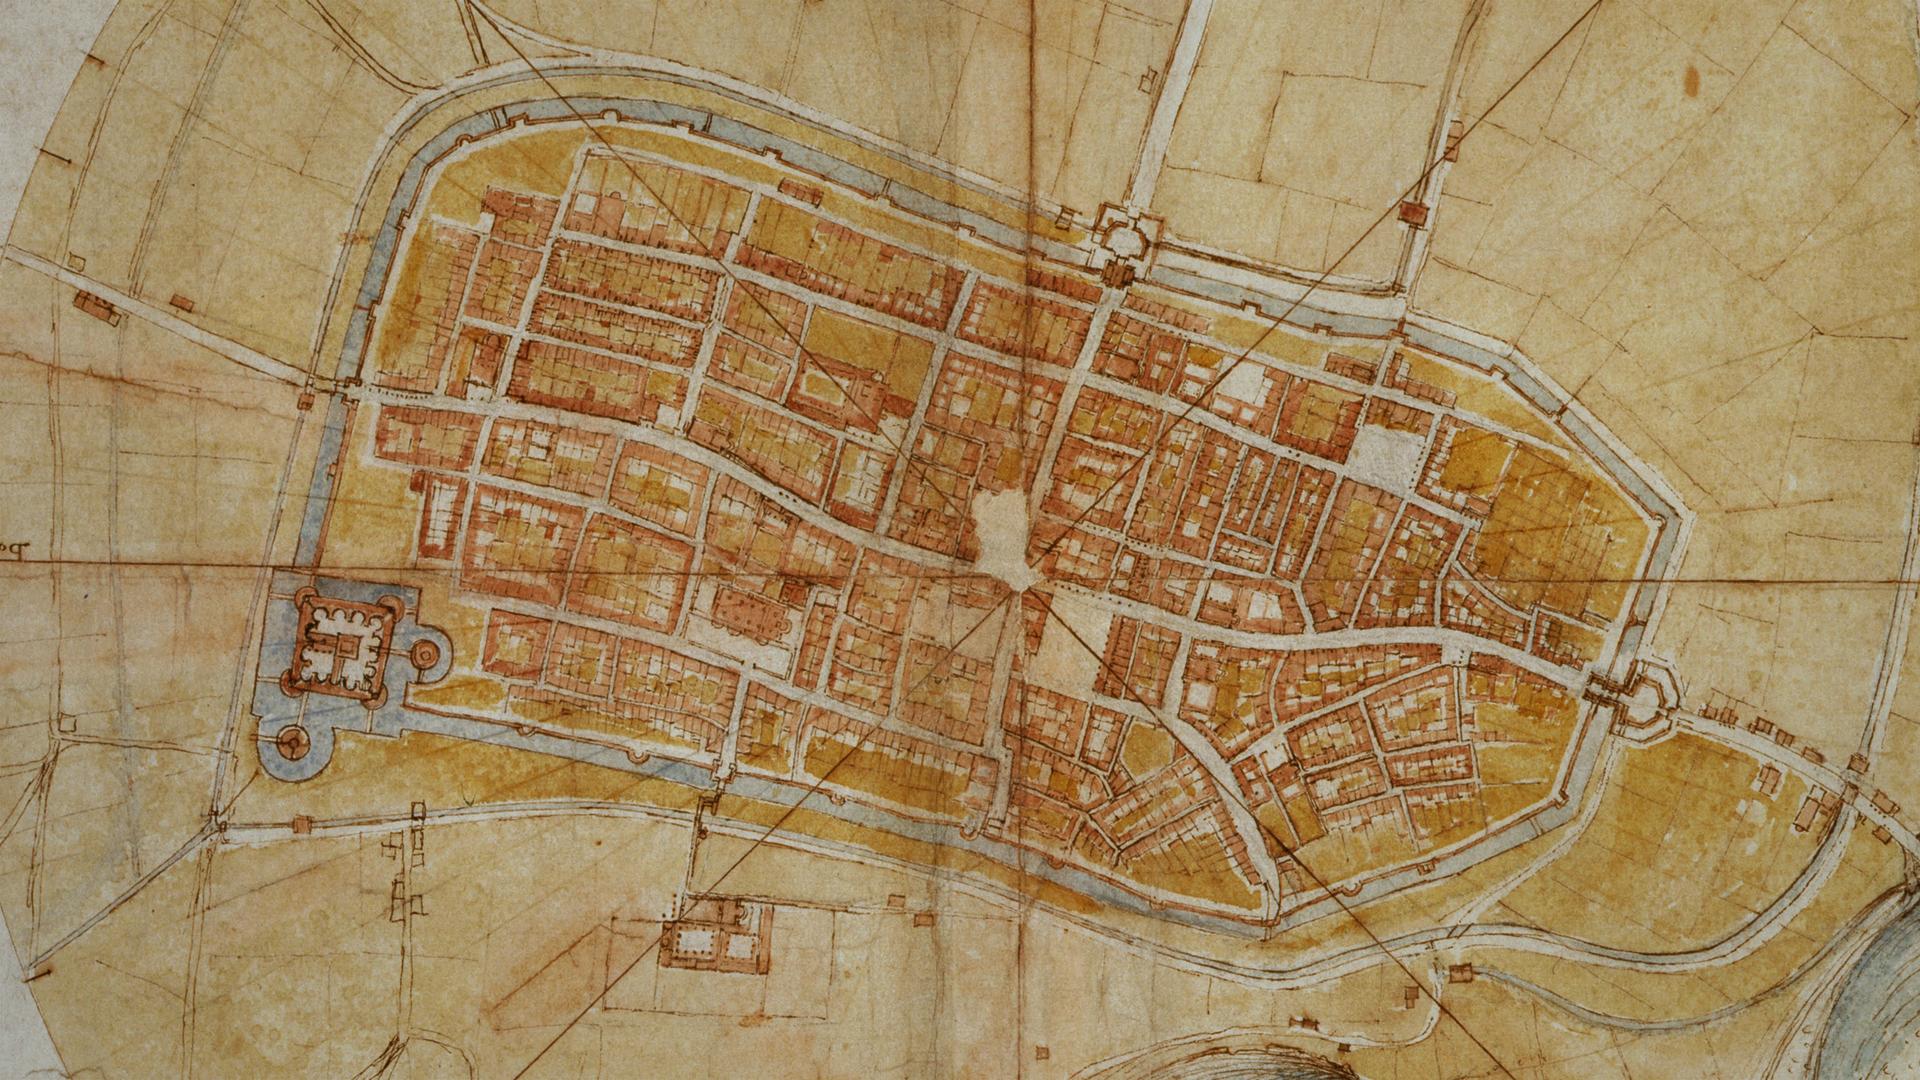 Leonardo's map of Imola